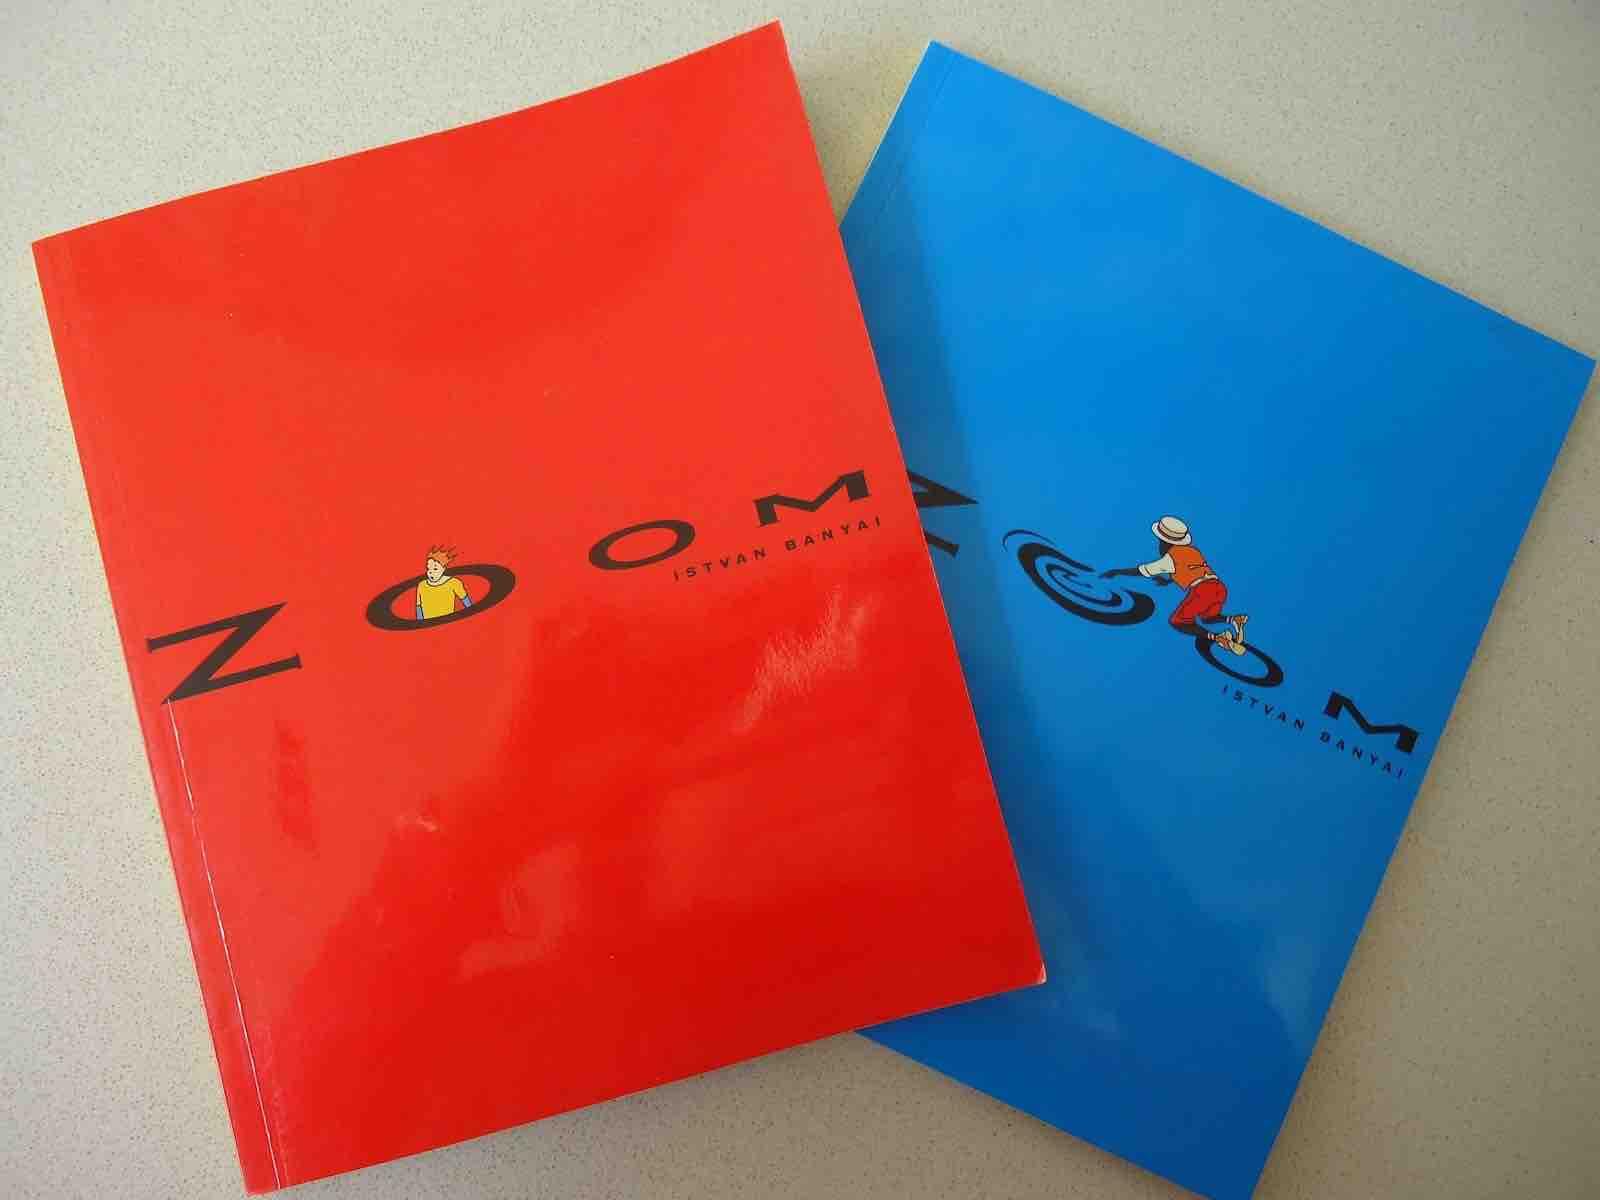 Zoom – Istvan Banyai